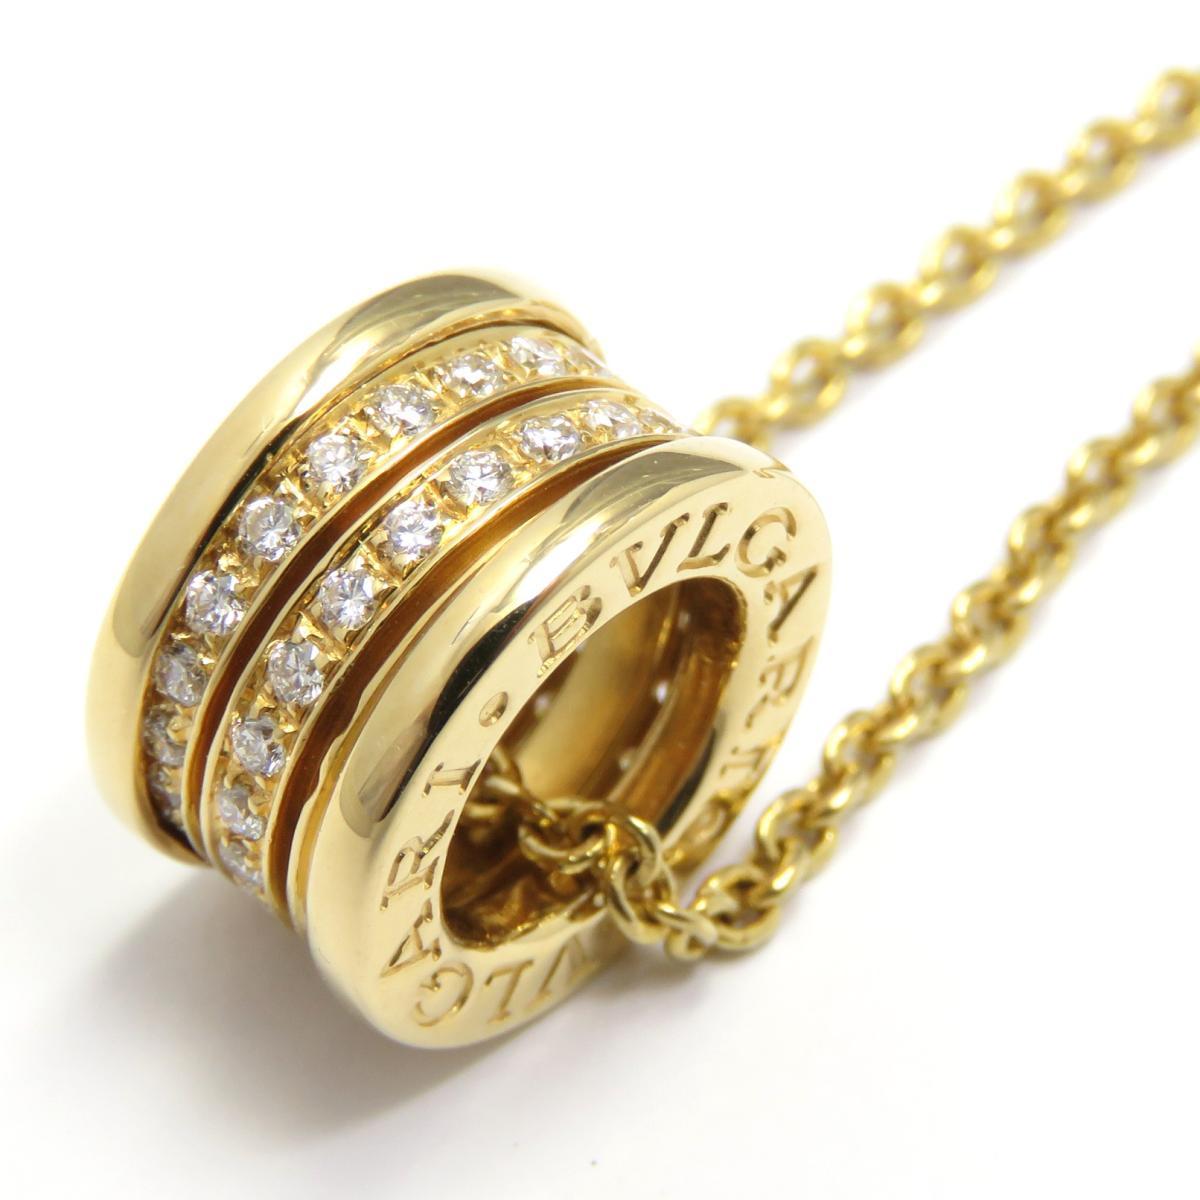 BVLGARI(ブルガリ)/B-zero1ダイヤモンド ネックレス ビーゼロワン/ネックレス/ゴールド系/K18YG(750)イエローゴールド×ダイヤモンド(石目刻印無)/【ランクA】【中古】